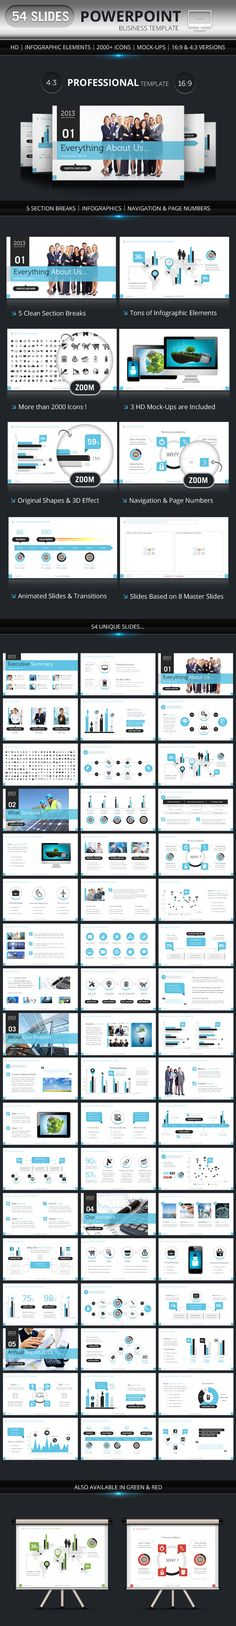 BALANCE PowerPoint Presentation Template Best PowerPoint - powerpoint presentations template